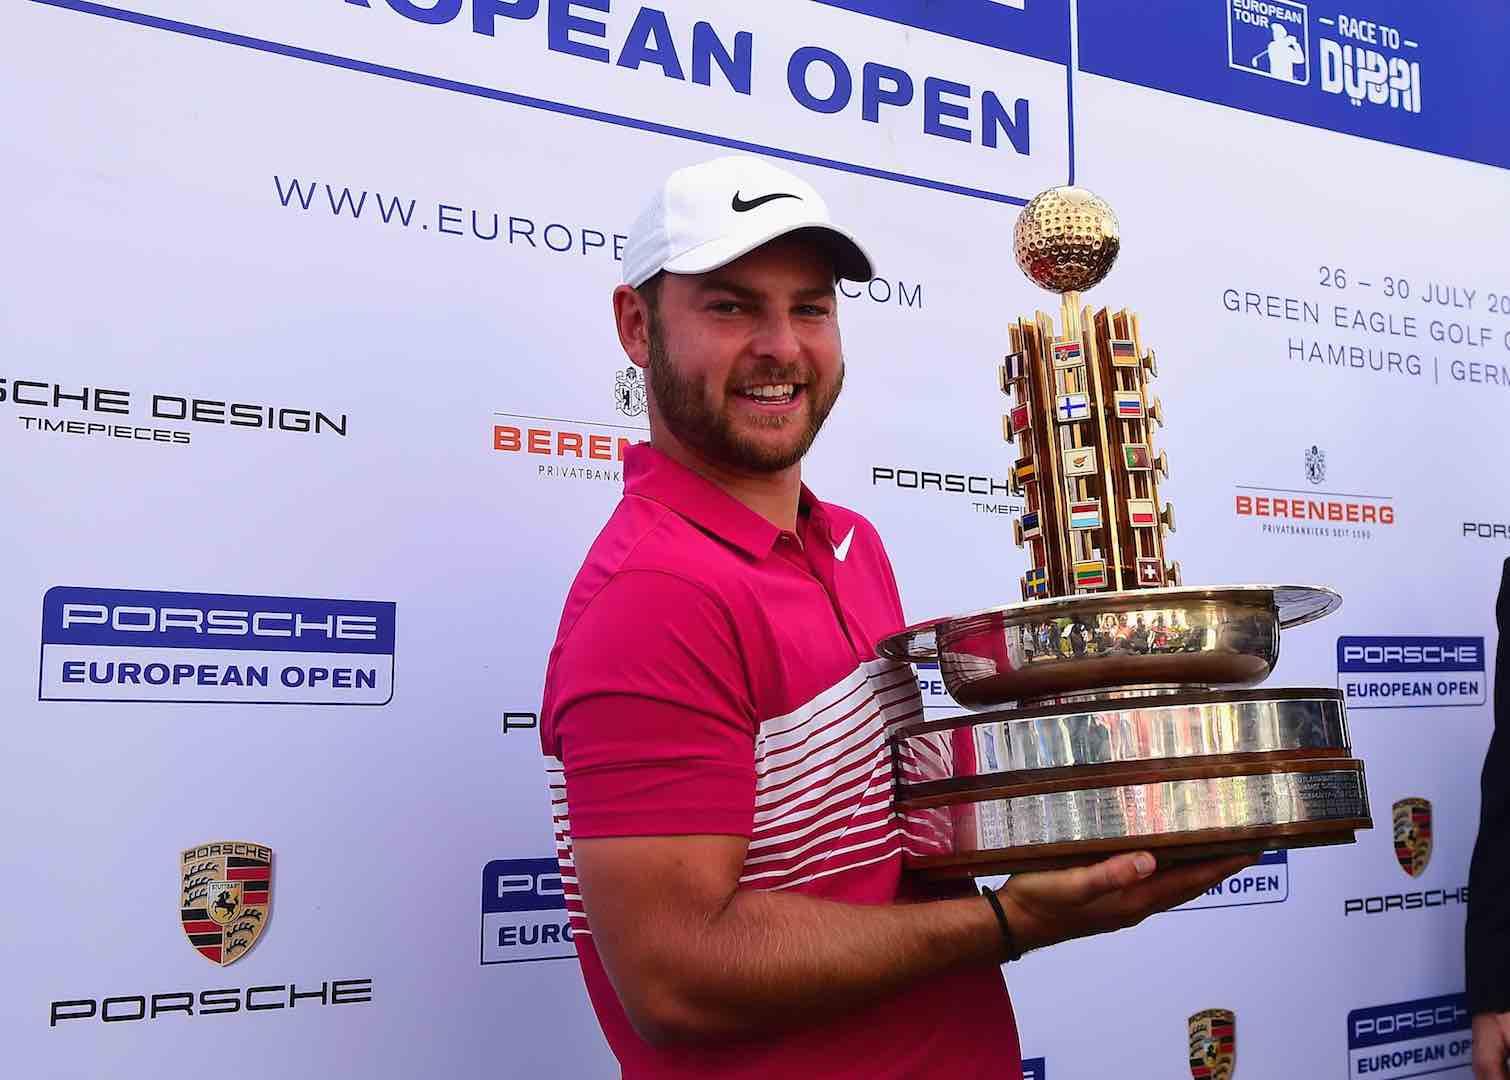 Jordan Smith claims maiden European Tour victory